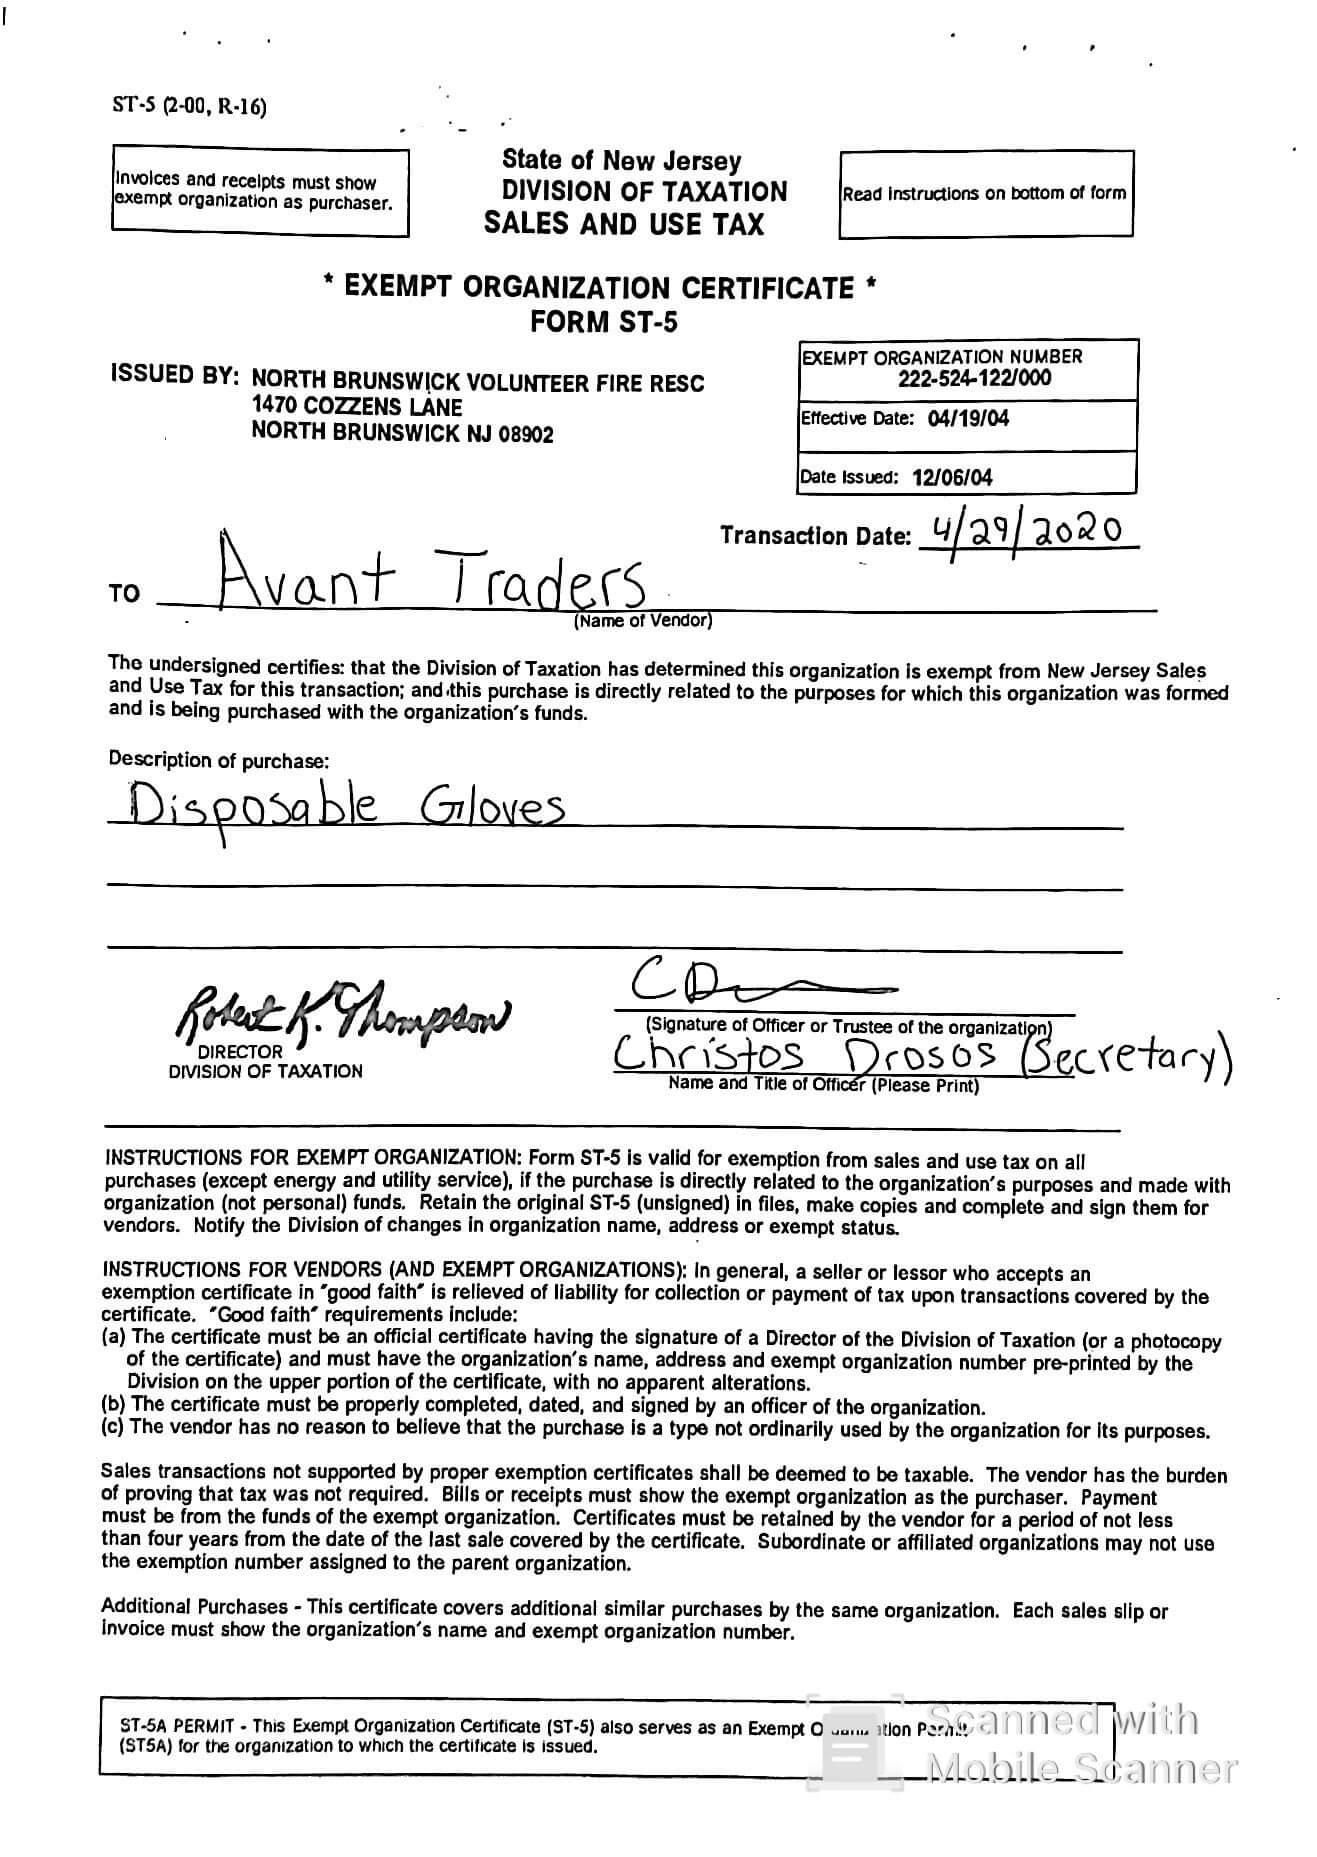 avantraders-certificate